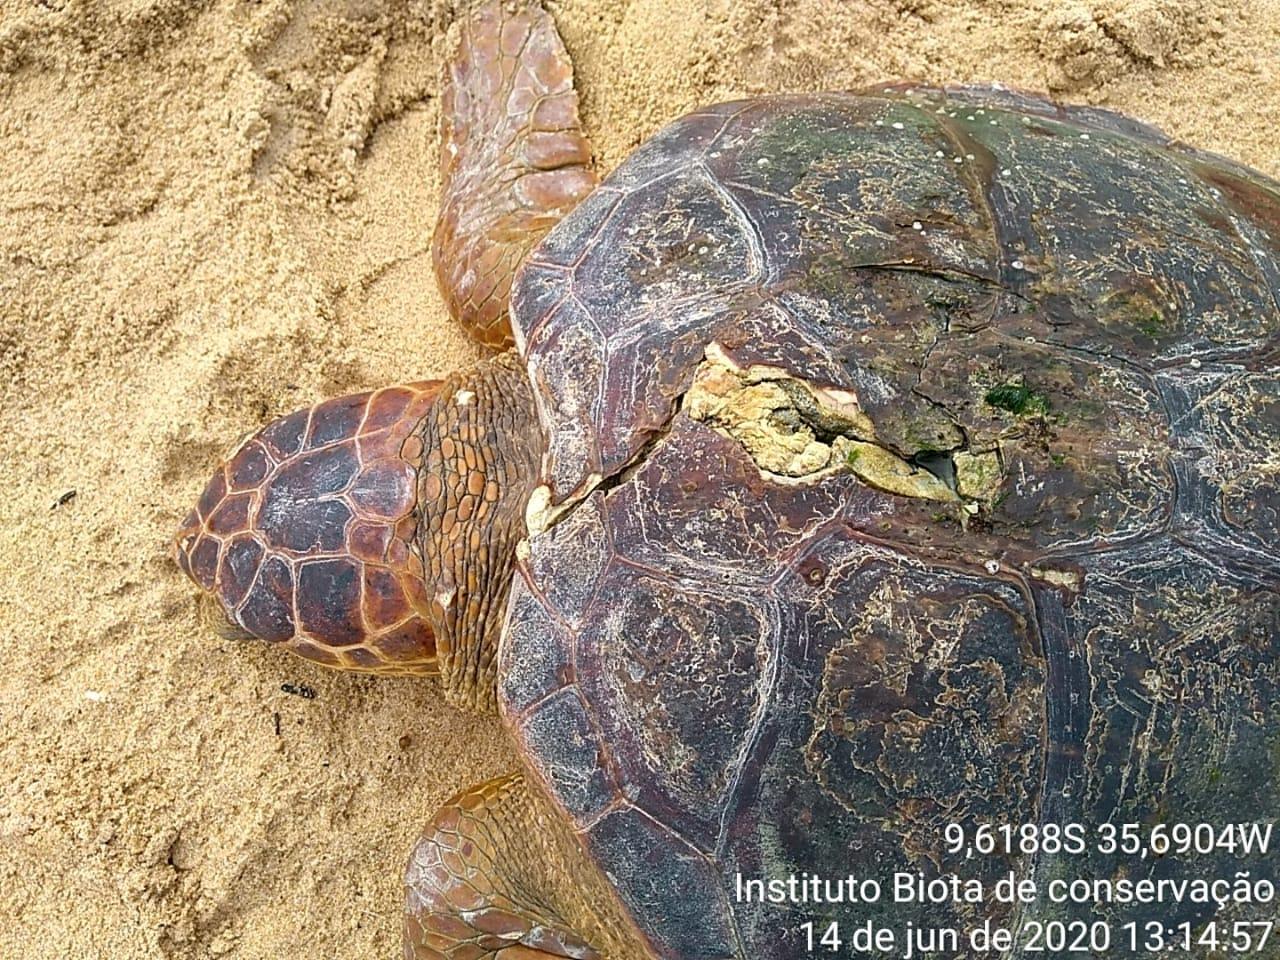 Tartaruga é resgatada ferida na praia de Cruz das Almas, em Maceió, AL